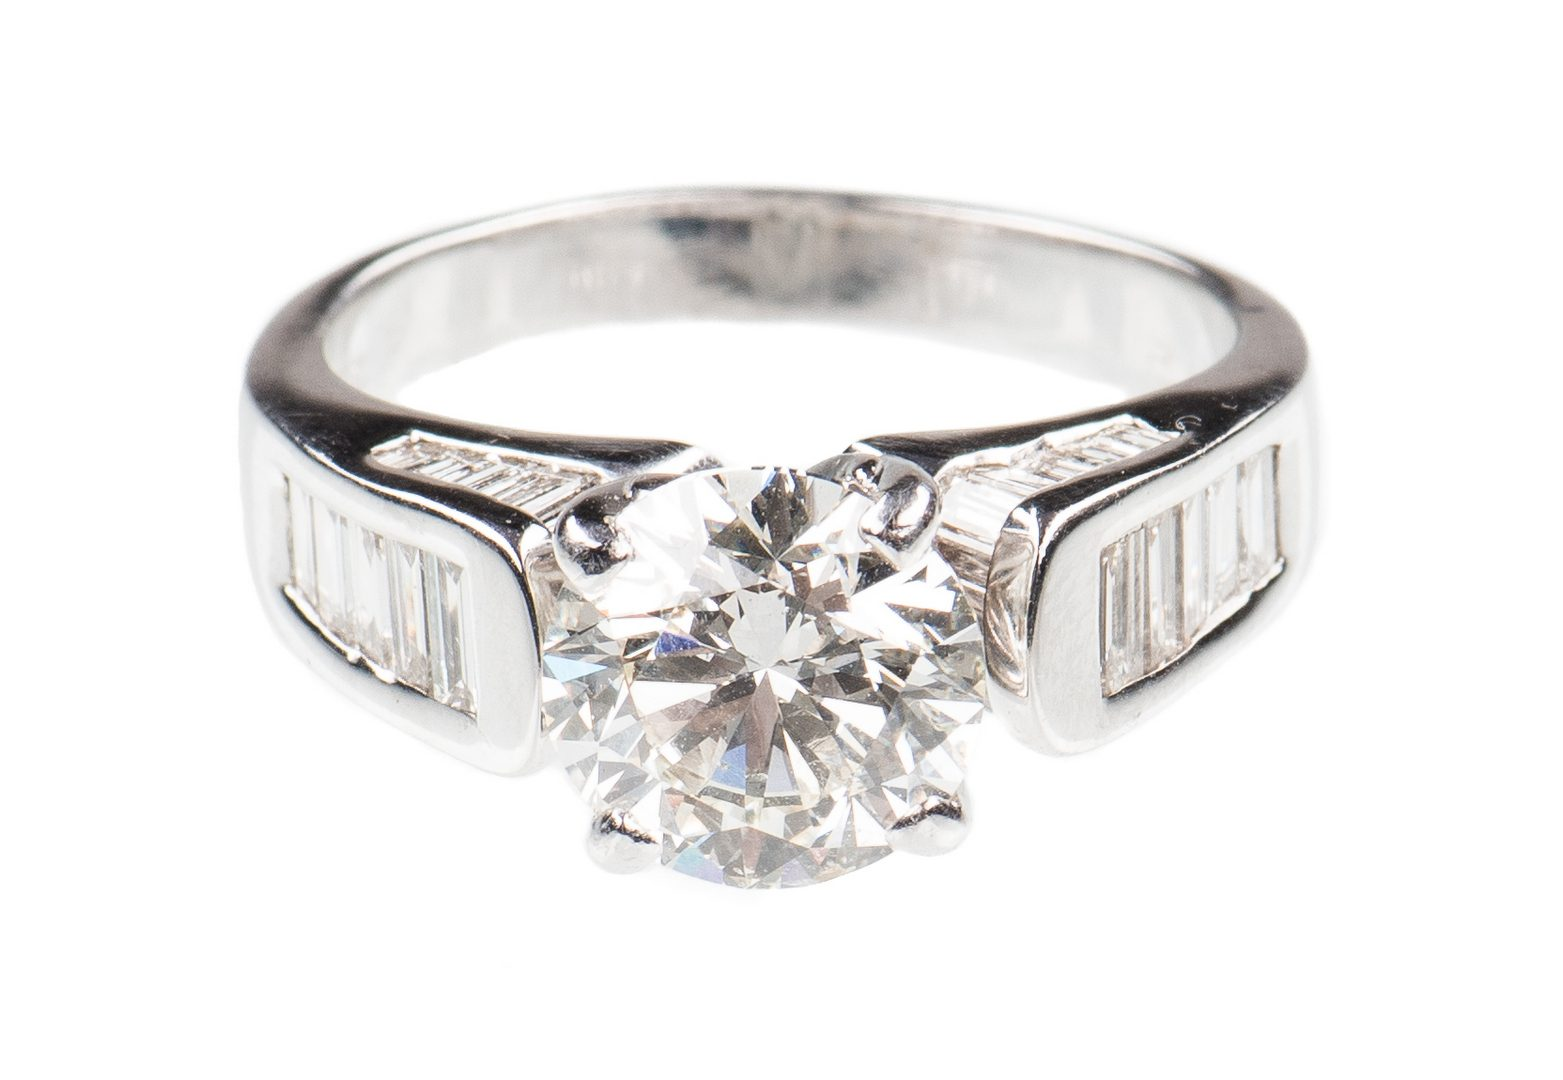 Lot 52: 2.53 ct. Round Diamond Ring